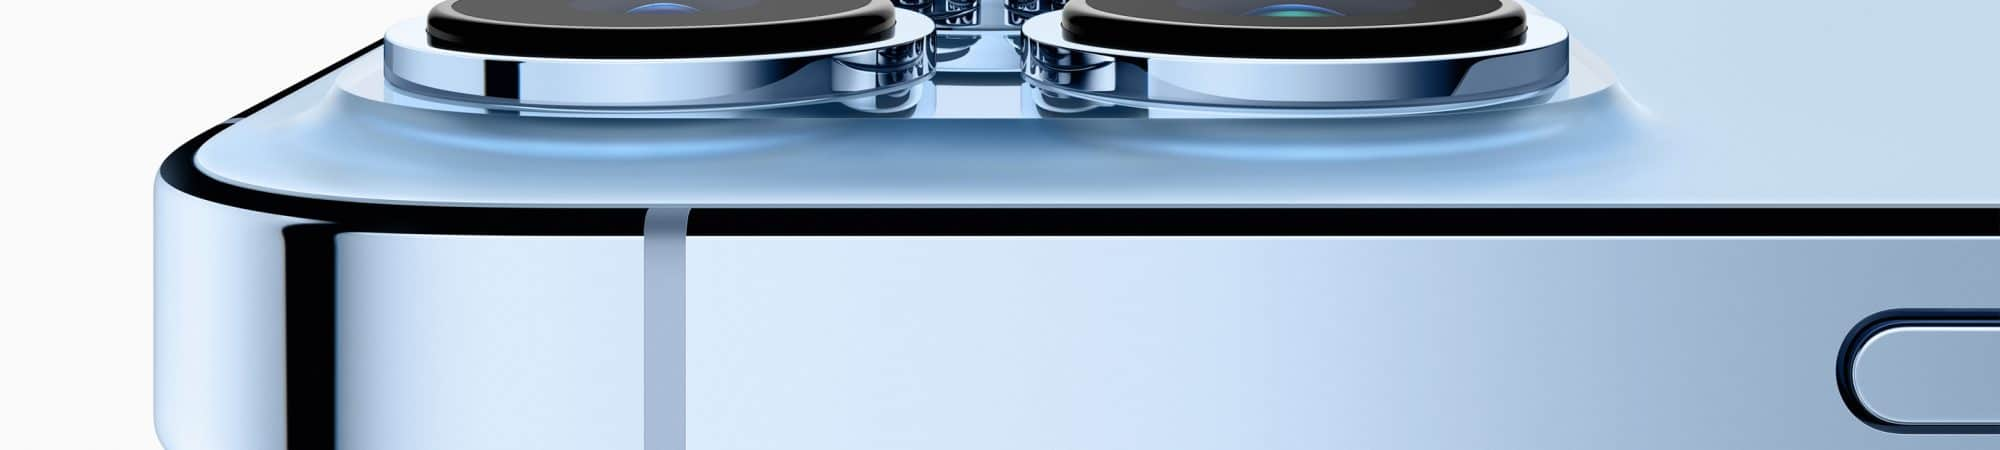 iPhone 13 Pro Max (Imagem: divulgação/Apple)